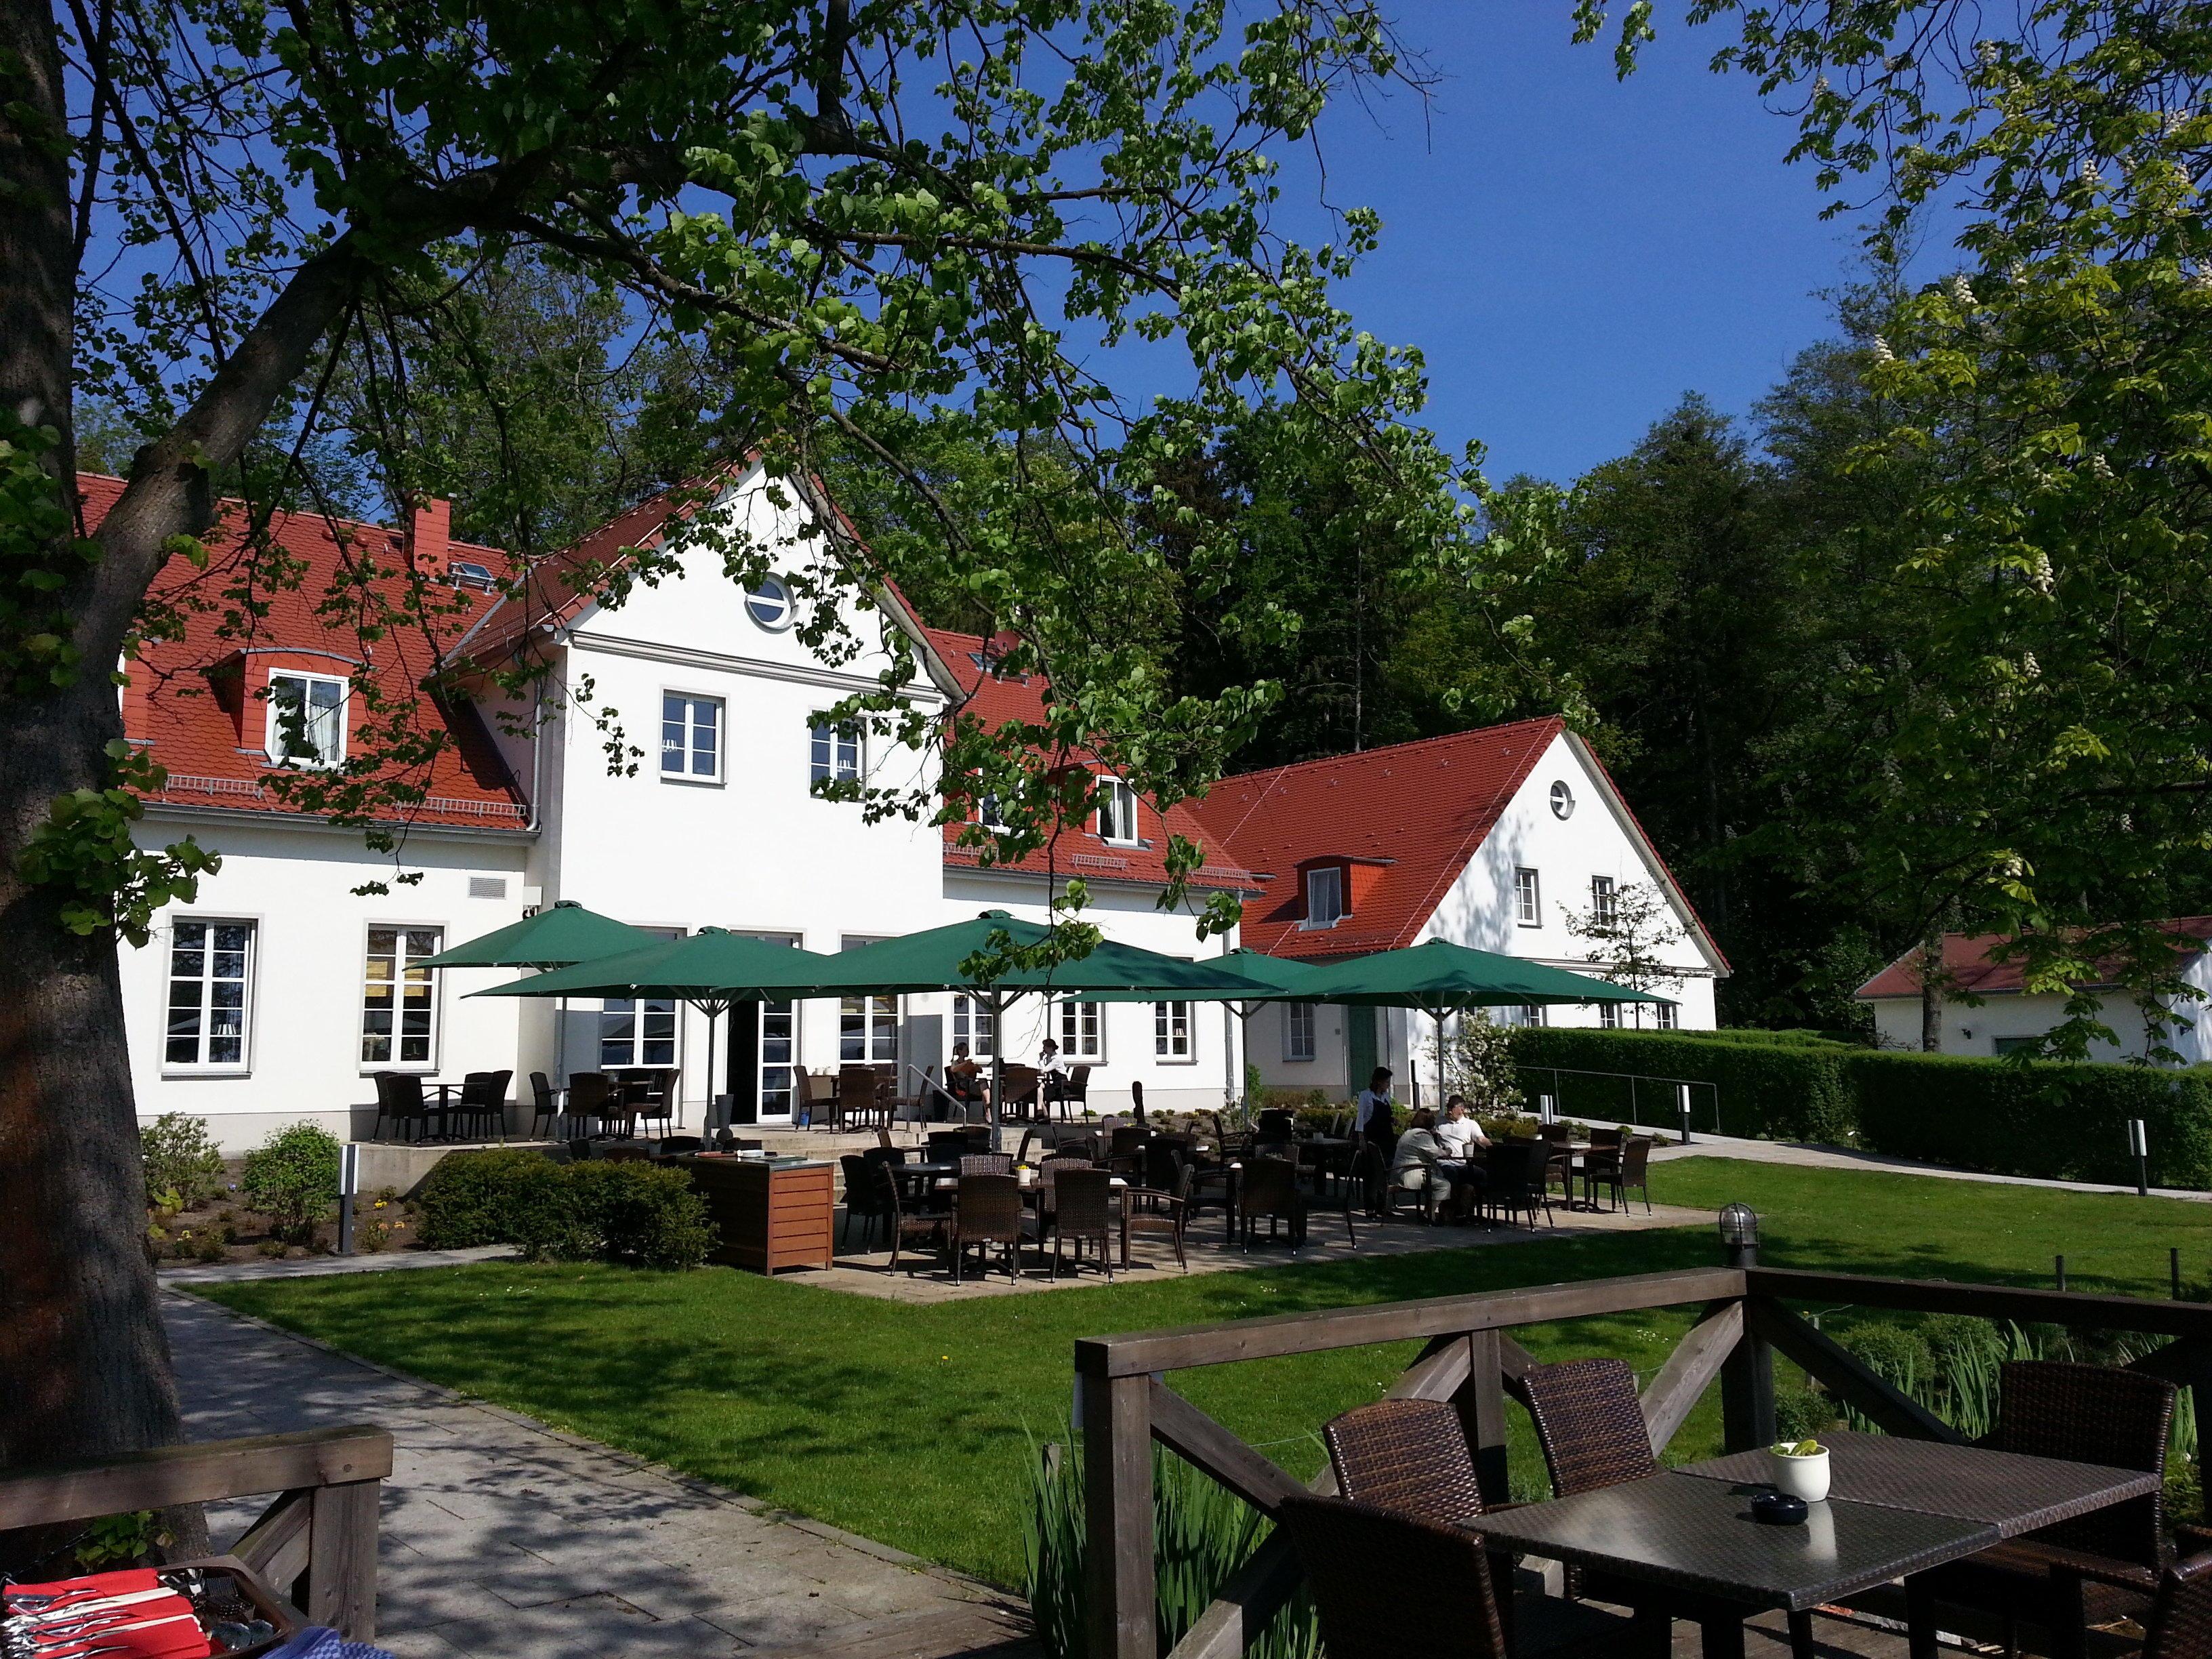 Cafe Wildau Hotel Werbellinsee